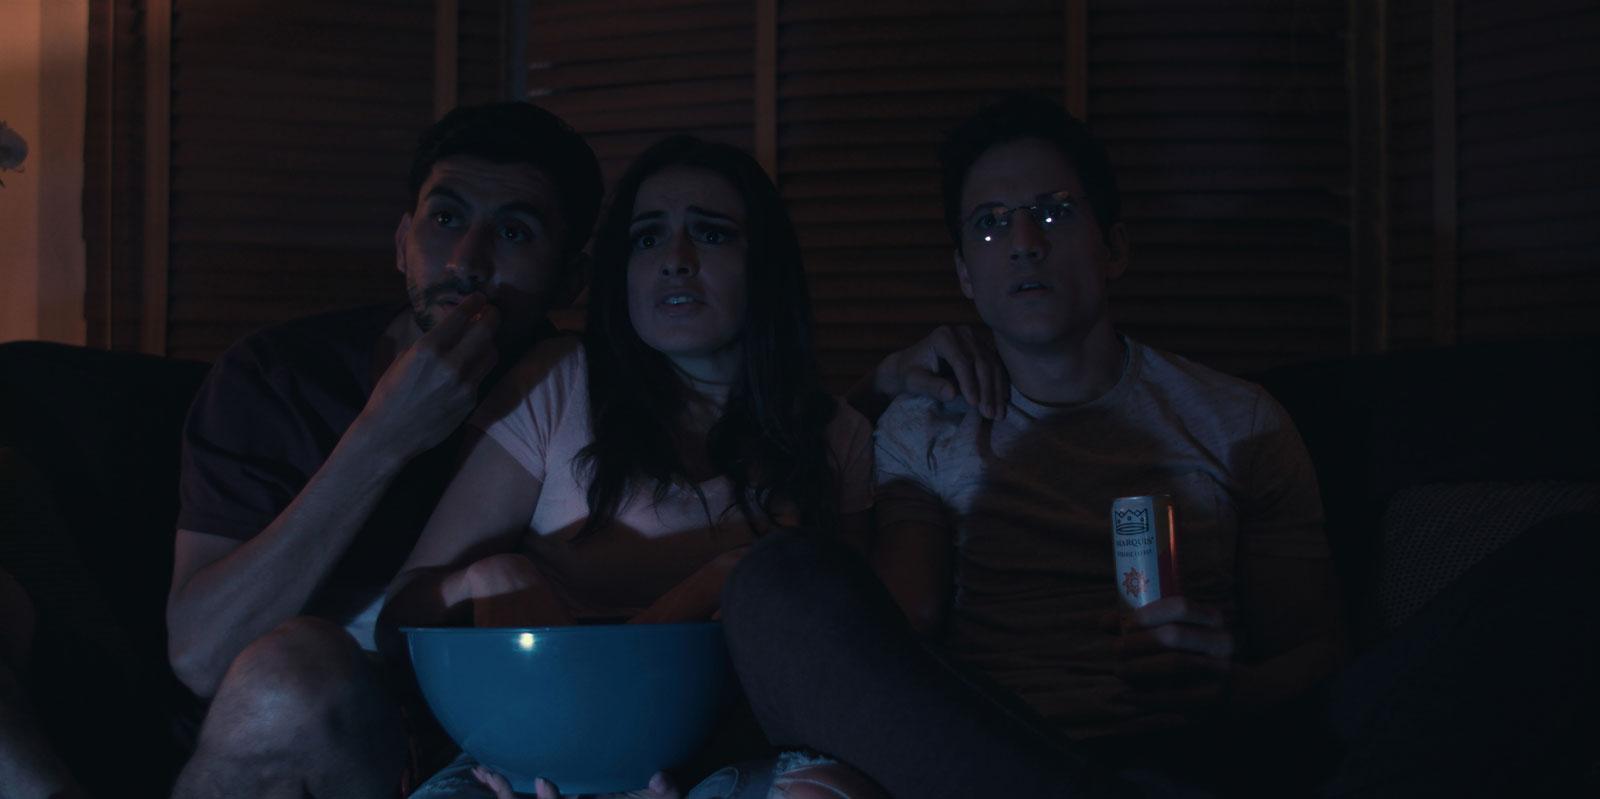 Isaac-(Rene-Mena)-Emily-(Vannessa-Vasquez)-and-Mark-(Mike-C.-Manning)-watch-TV.jpg